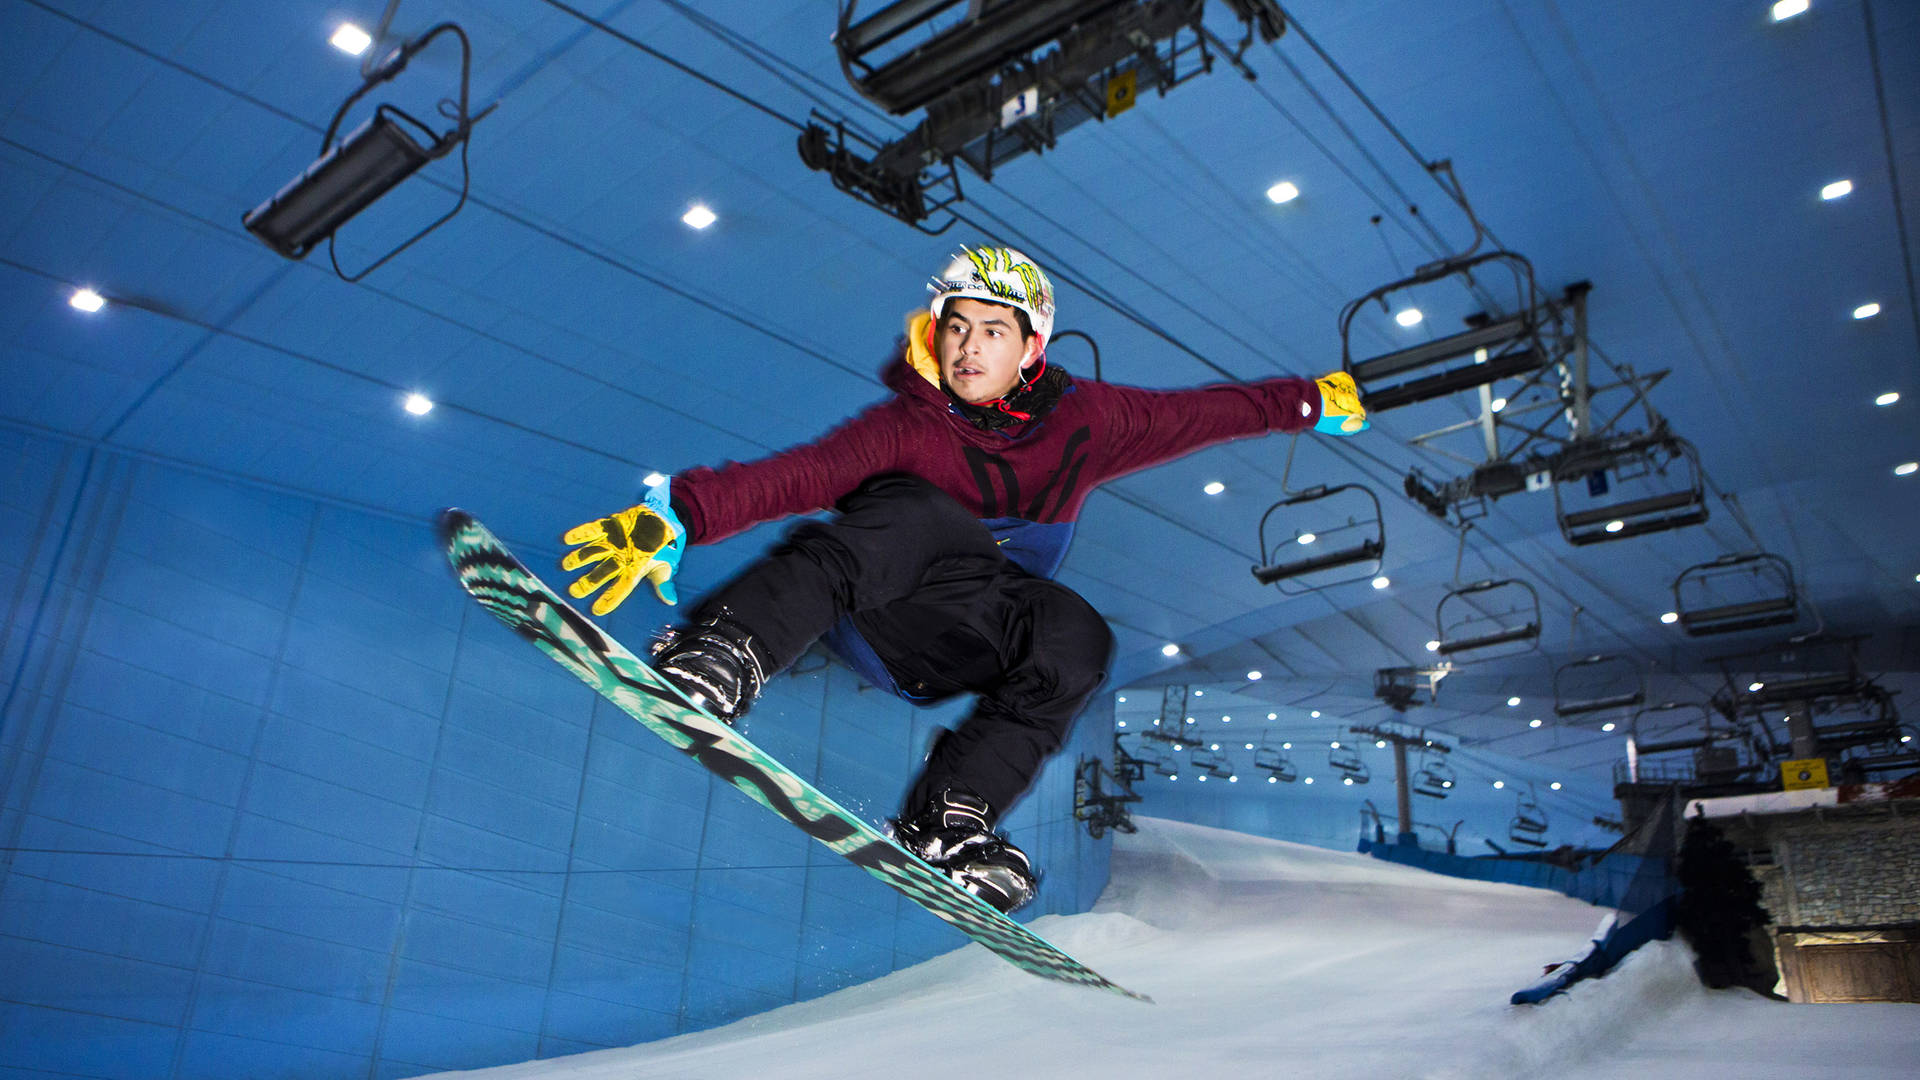 A young boy snowboard's down Ski Dubai's slope